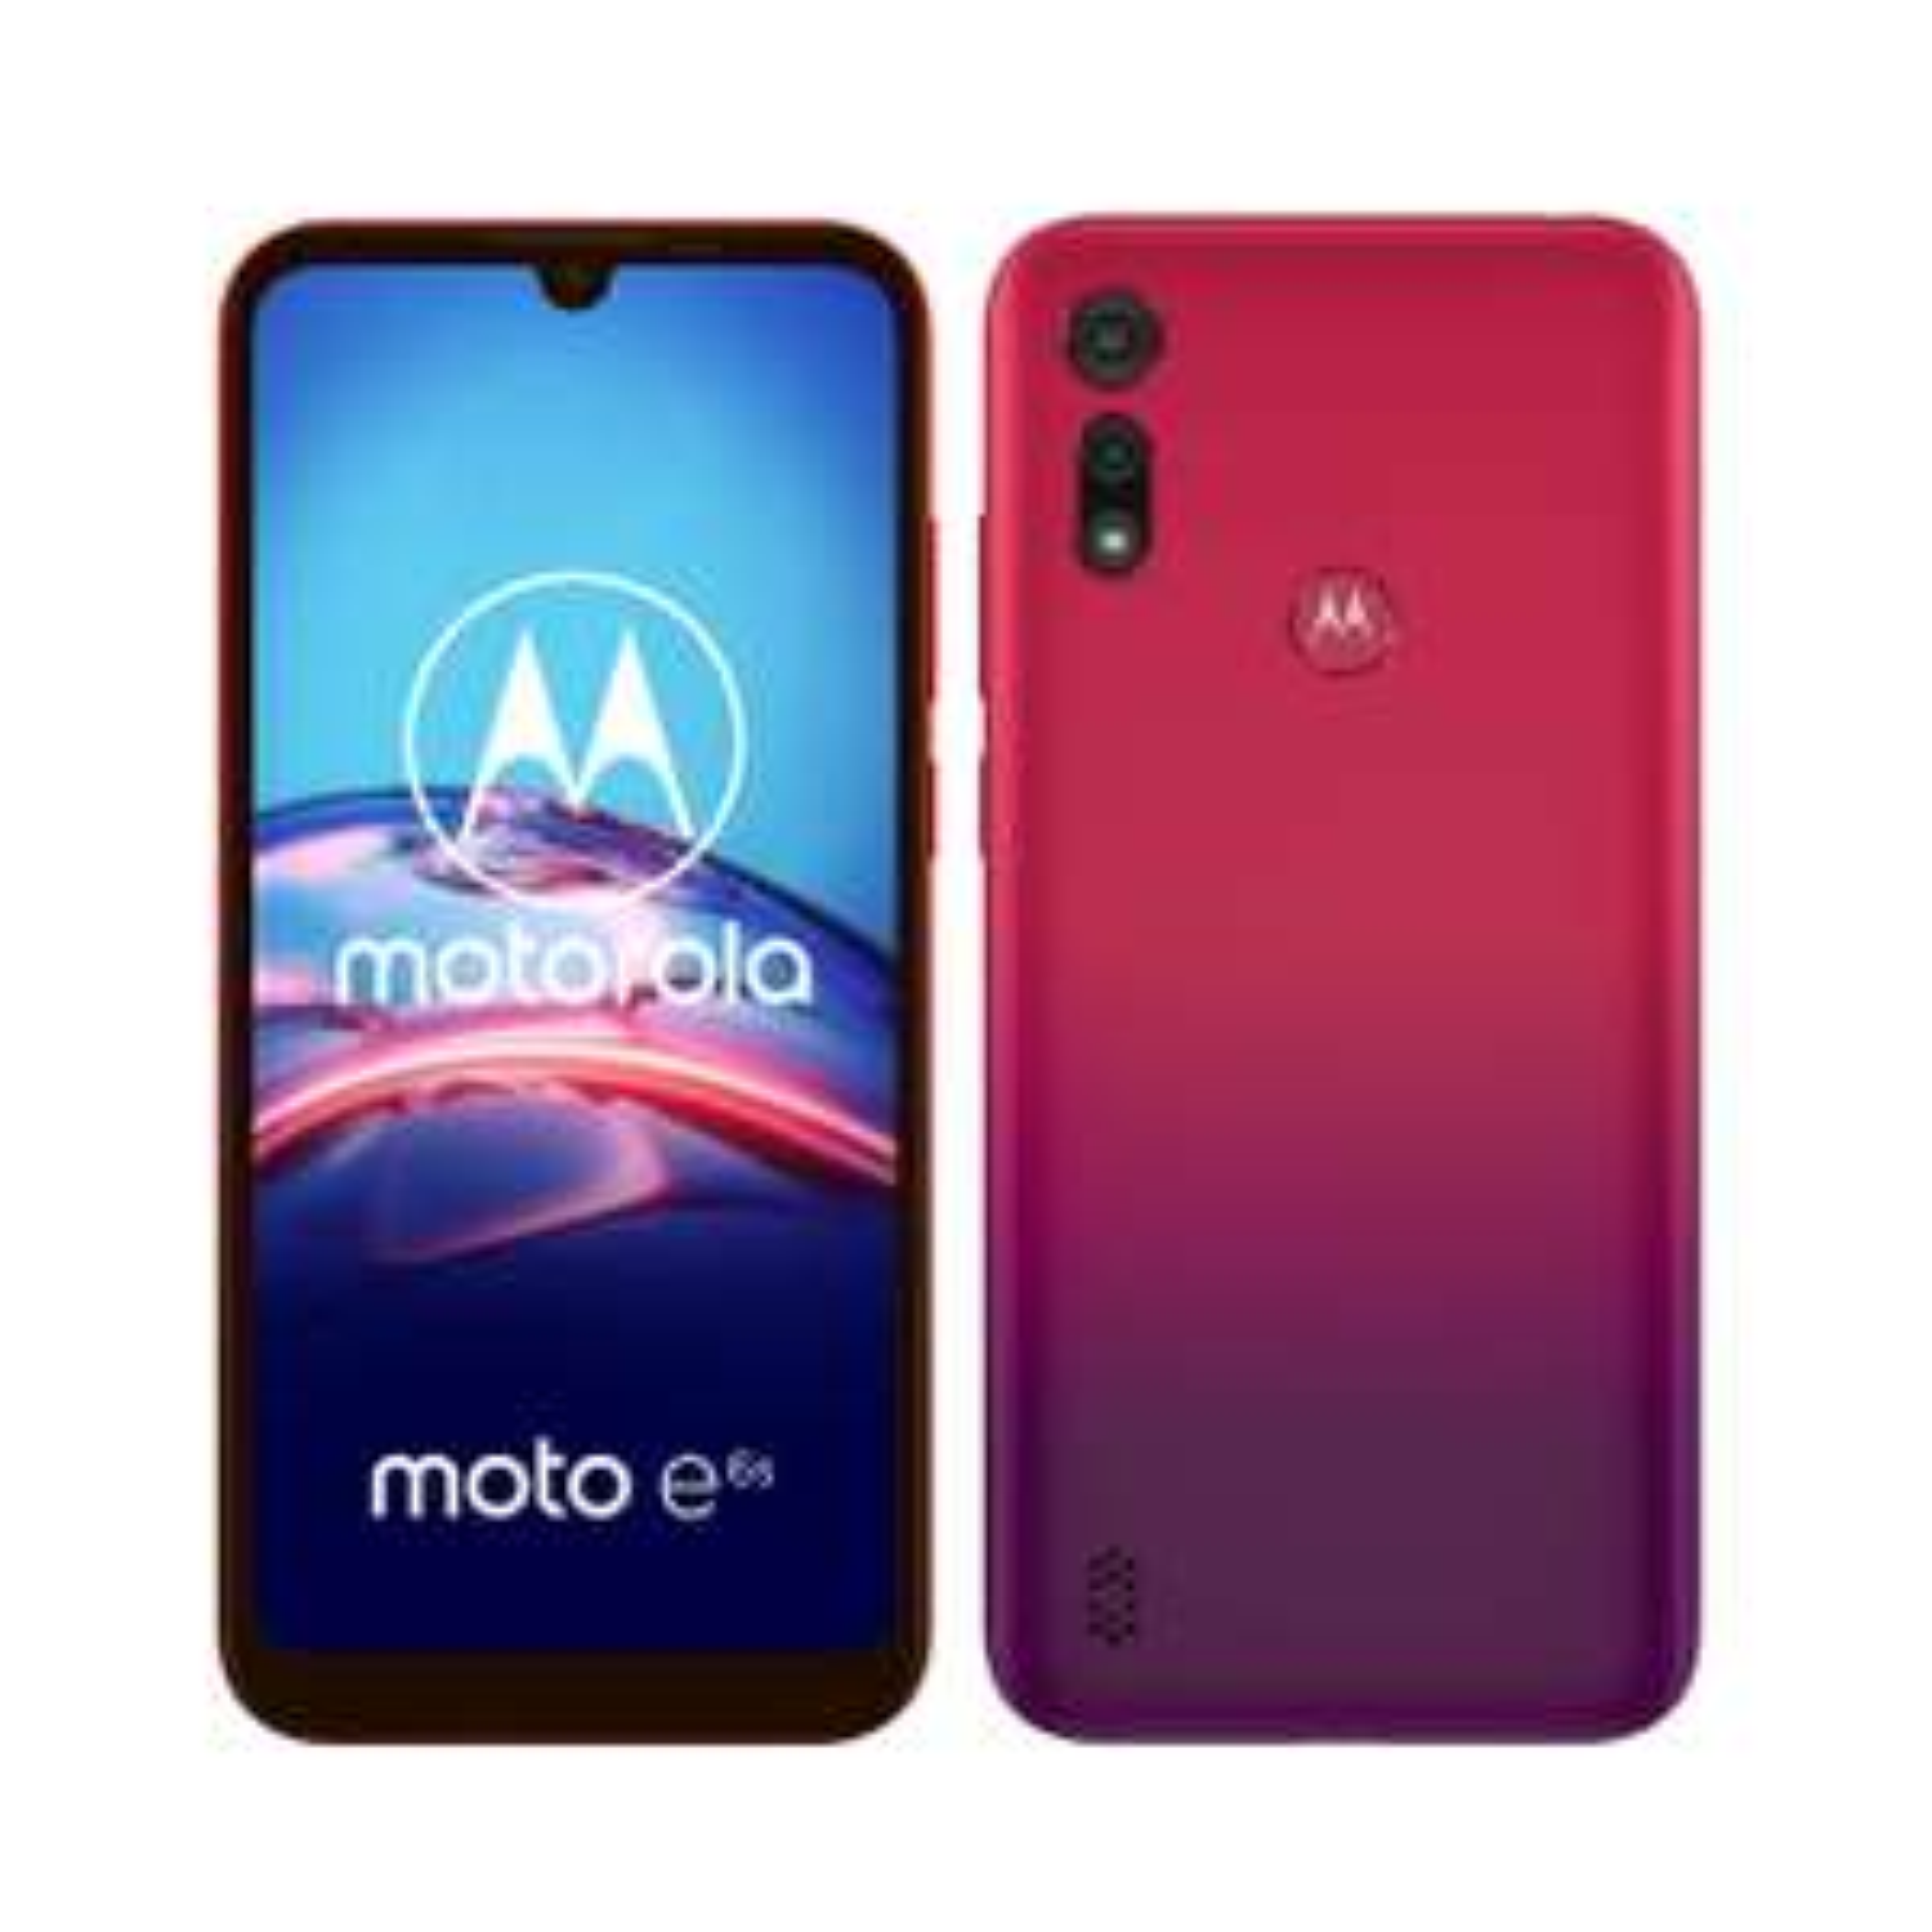 Moto e6s - Sunrise Red (Dual SIM) Smartphone @ Lenovo Store